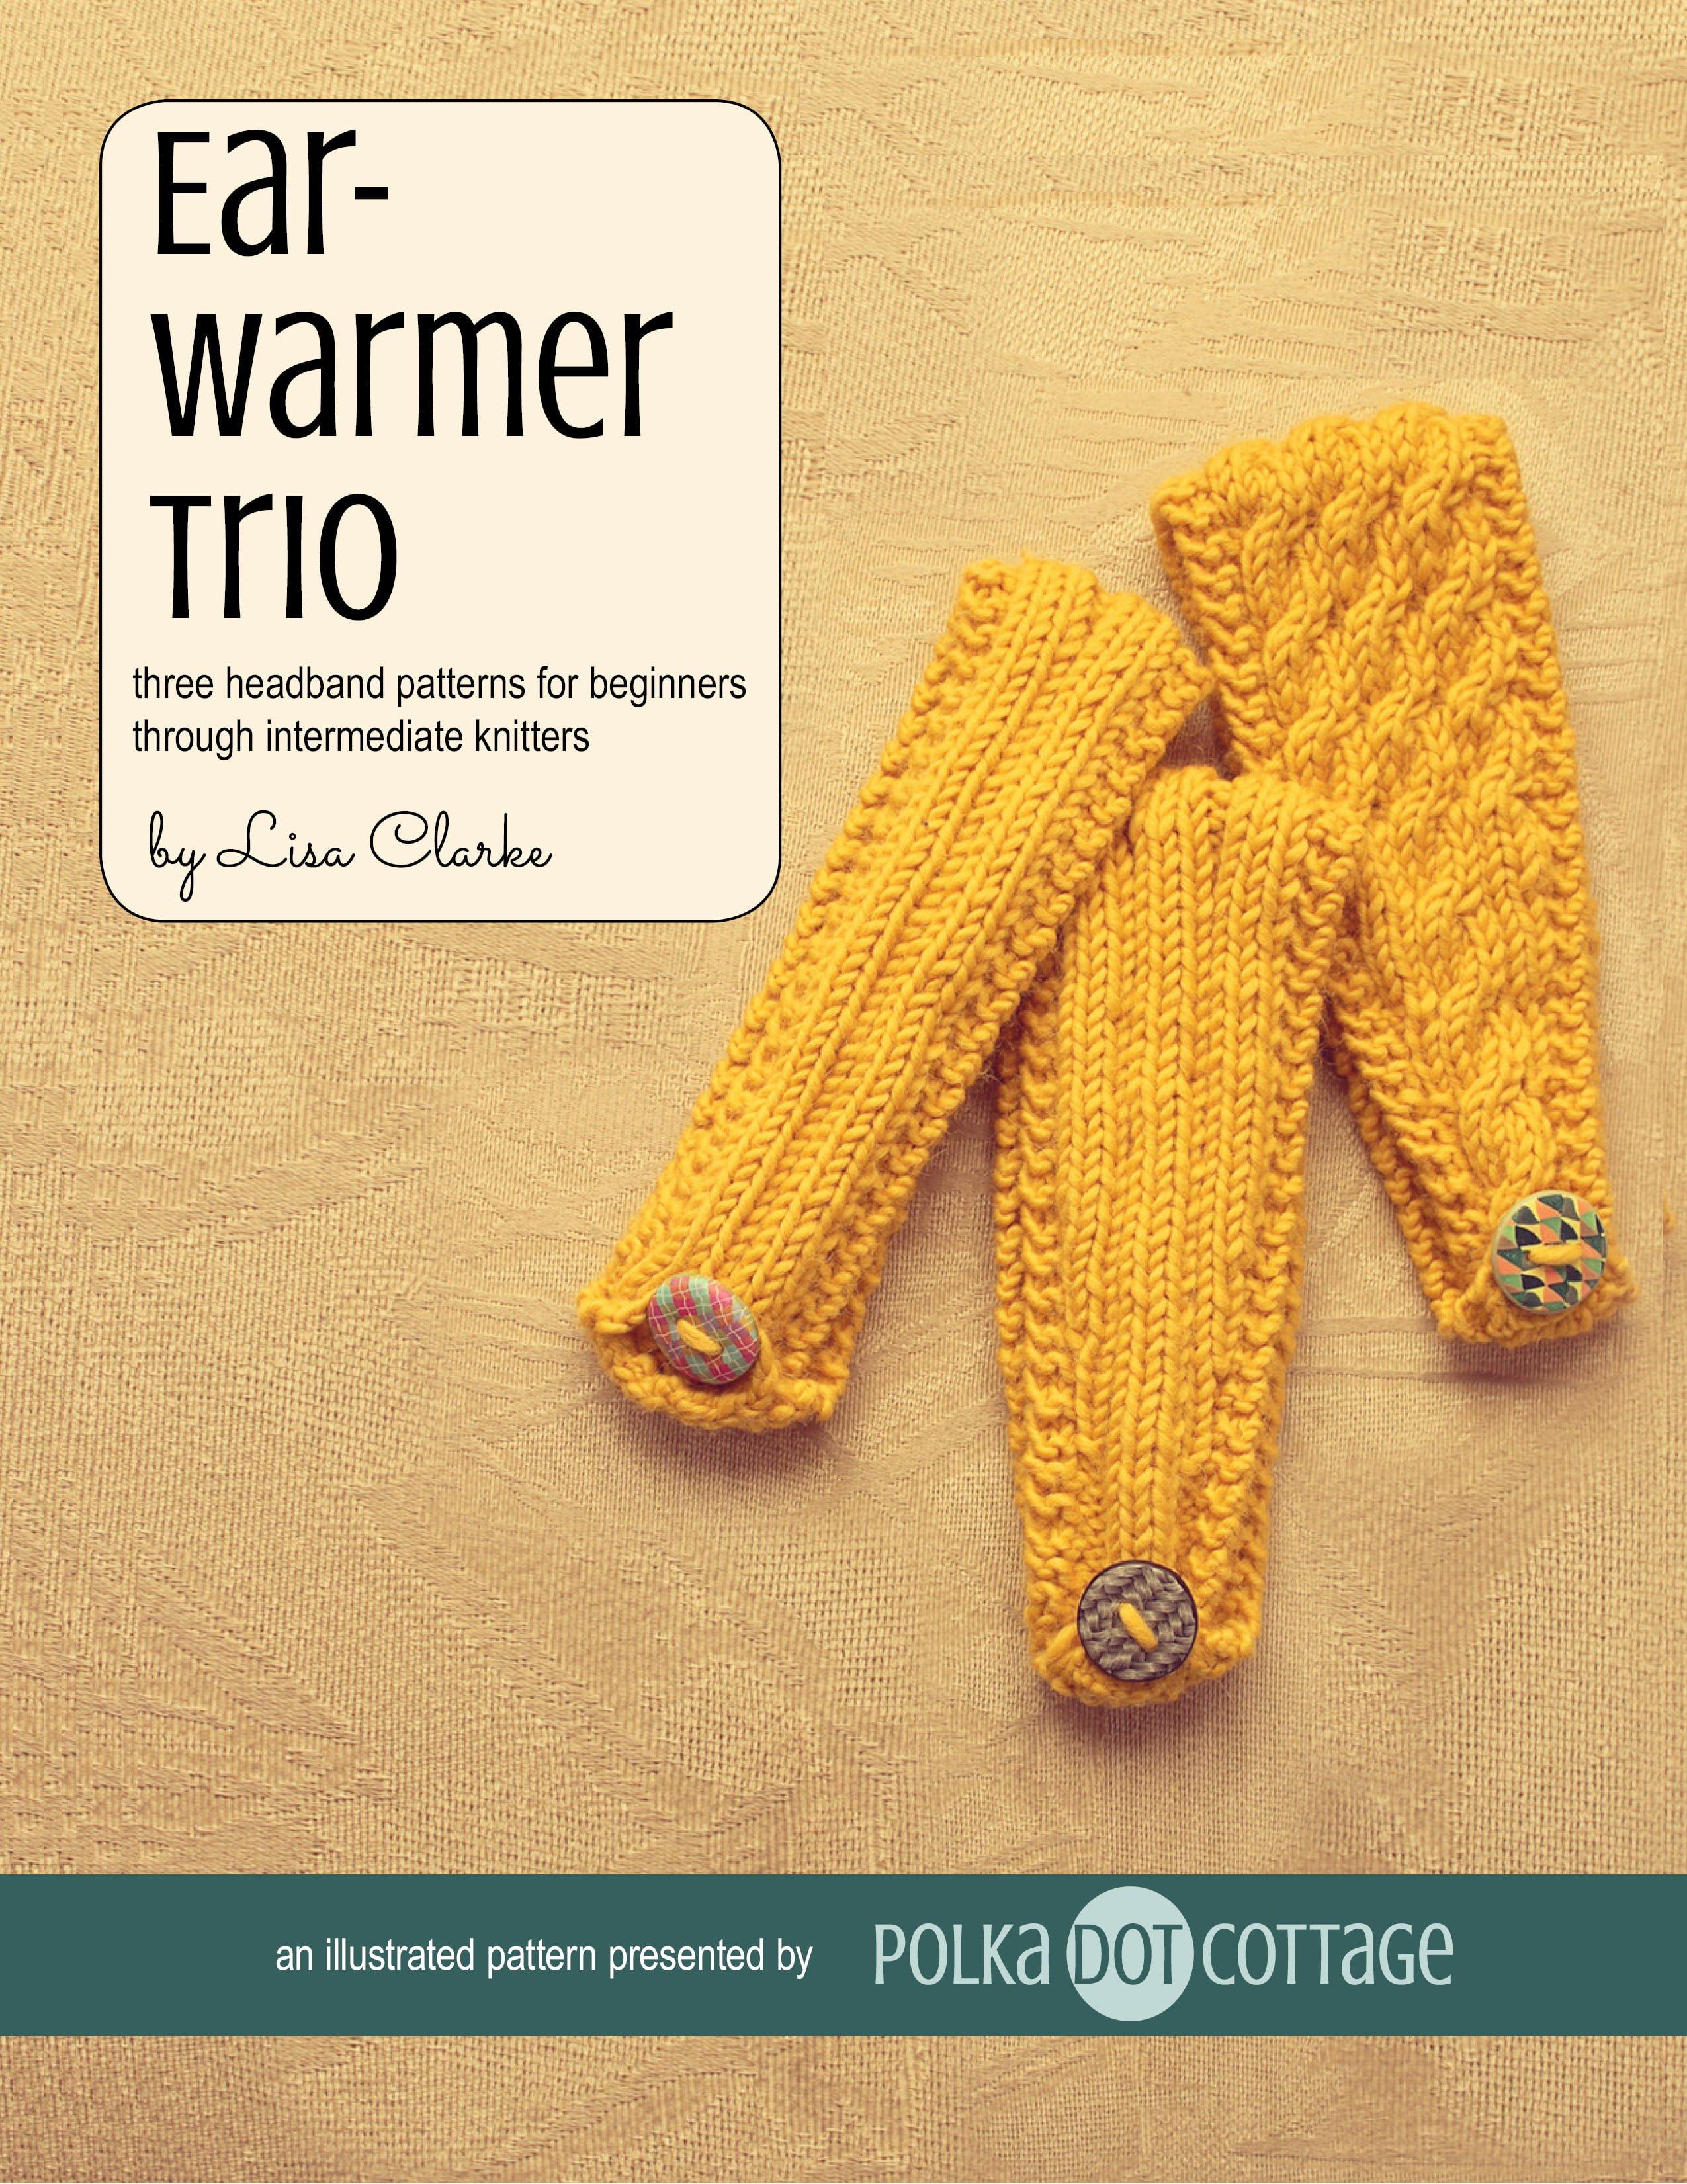 Loom Knitting Pattern Book Download : Earwarmer Trio Polka Dot Cottage